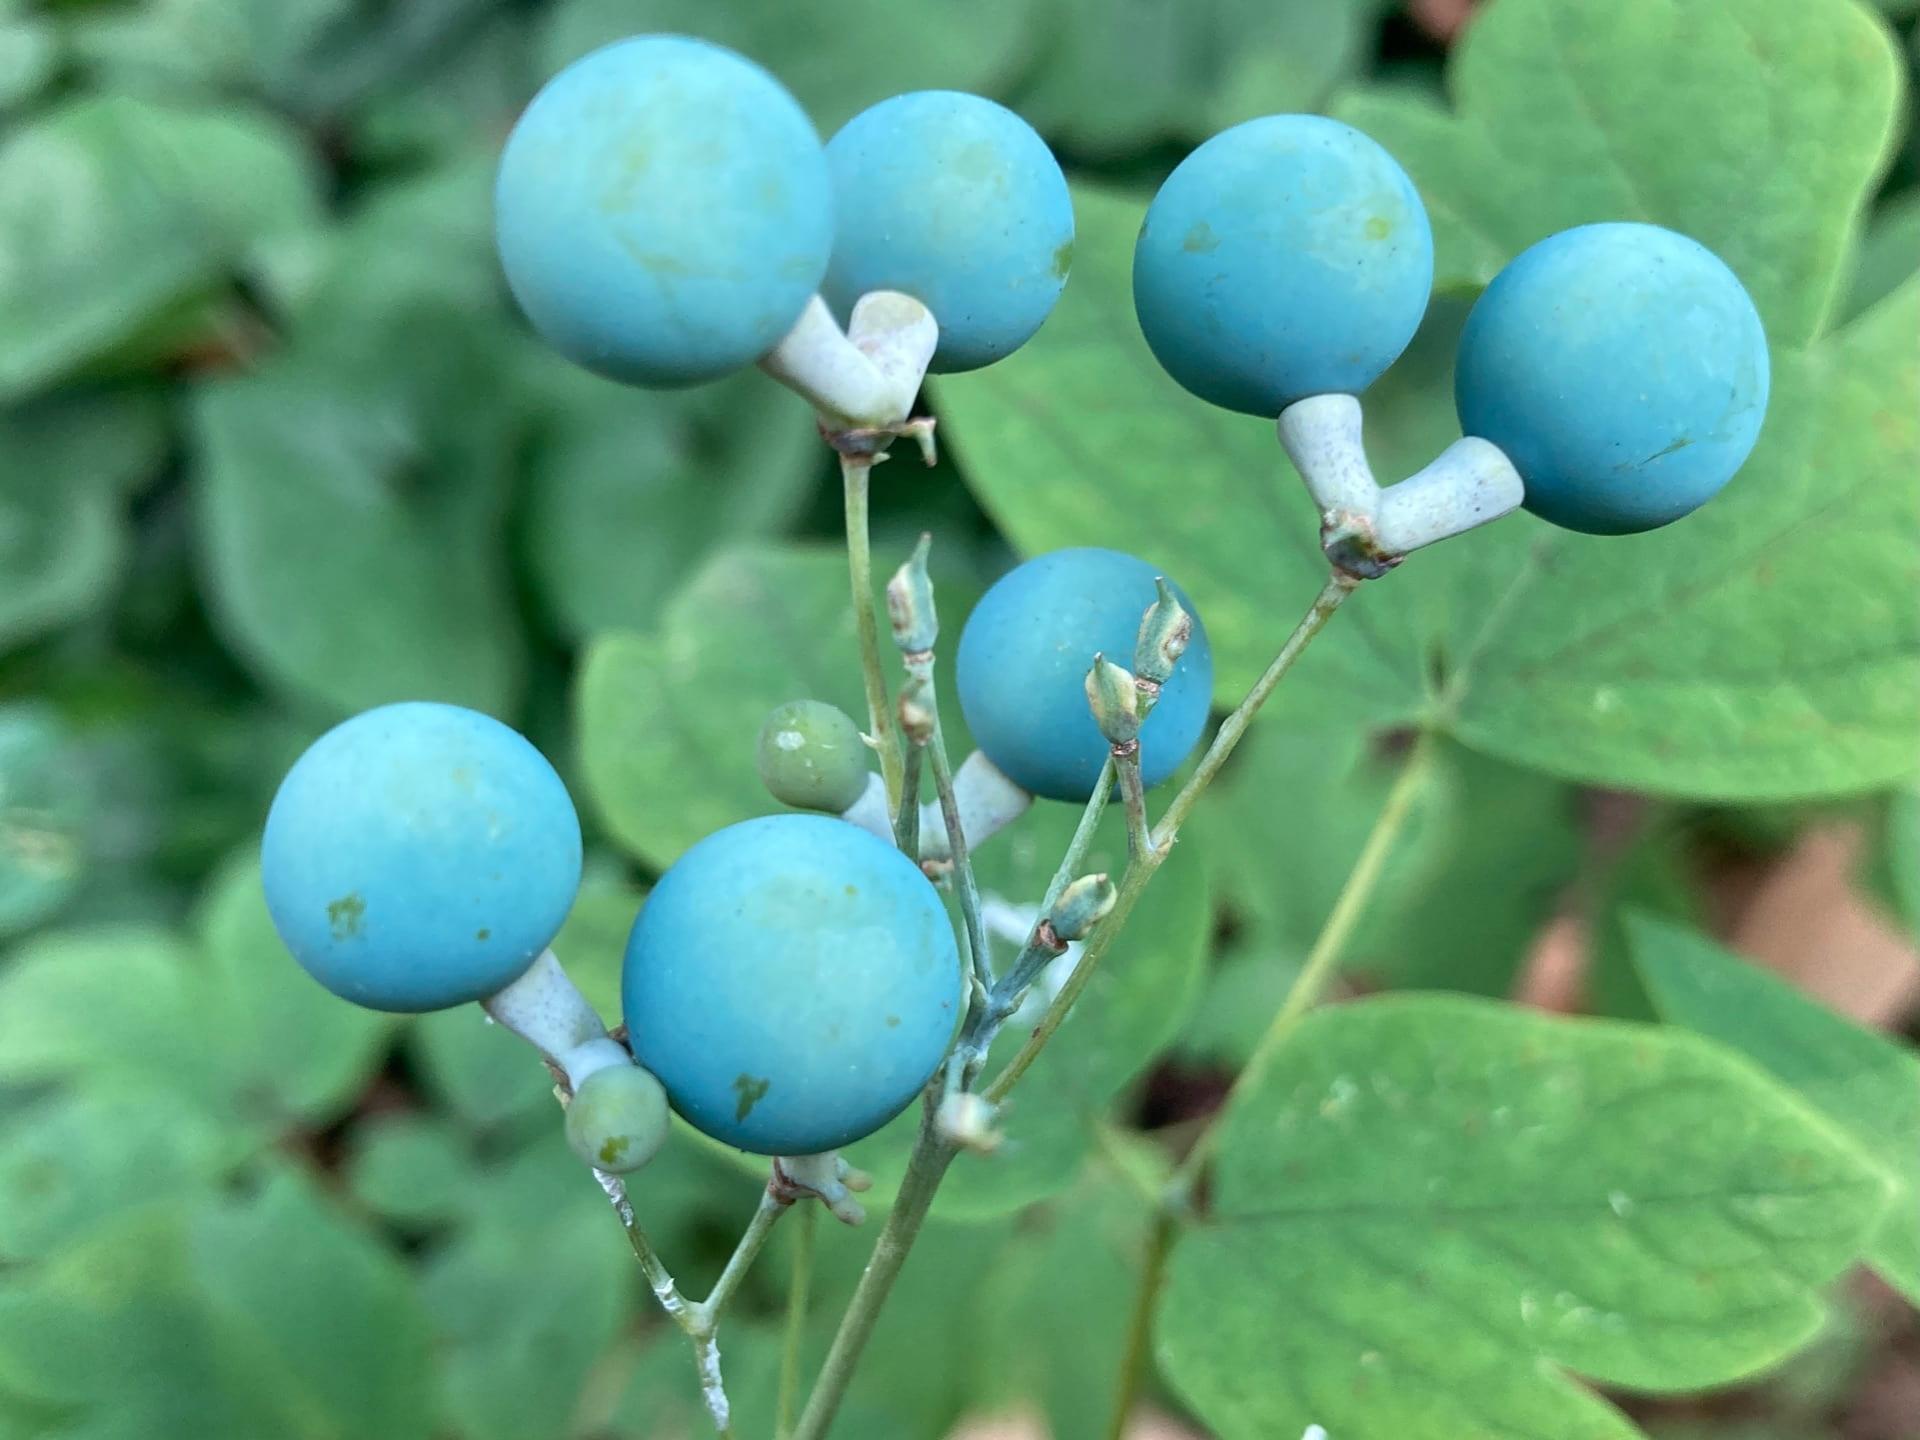 Blue cohosh (Caulophyllum thalictroides) bears glaucous twin fruits.